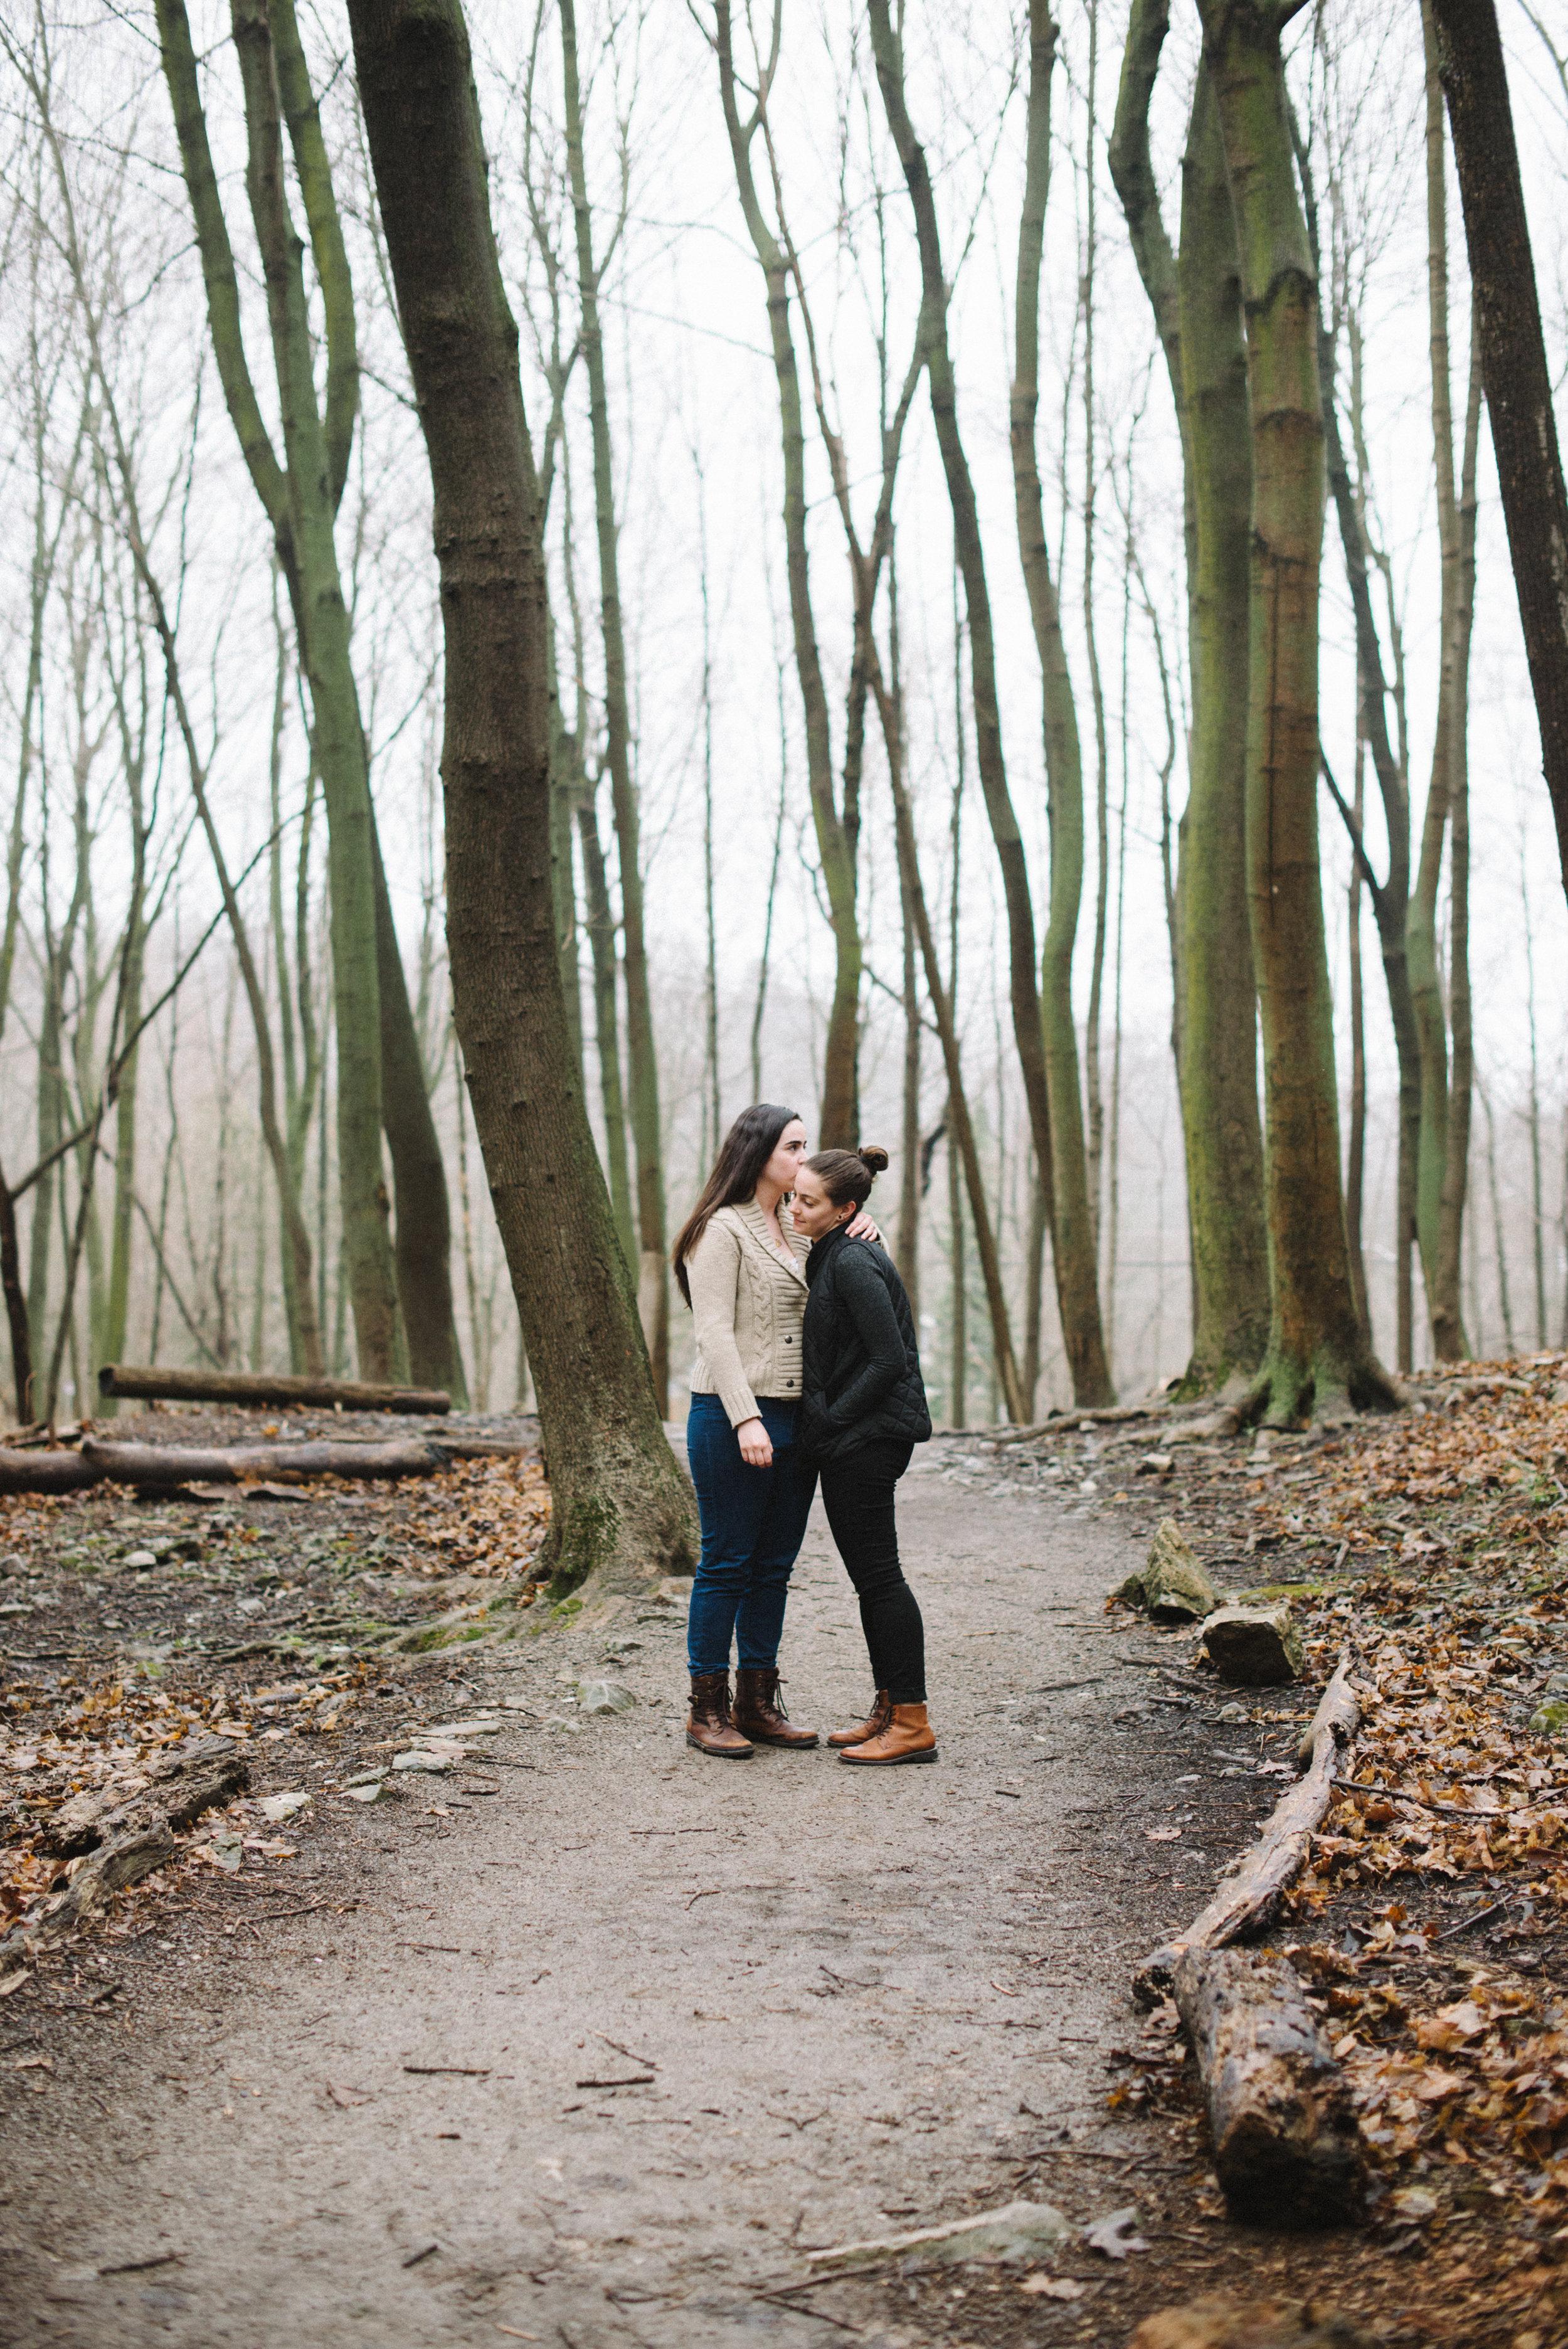 RosewoodWeddingPhotos-TeresaDeanna-EngagementSession-Hamilton-ShermanFalls-Ancaster-Hike-SameSexCouple-LGBTQ-TorontoWeddingPhotographer-Forest-Hike